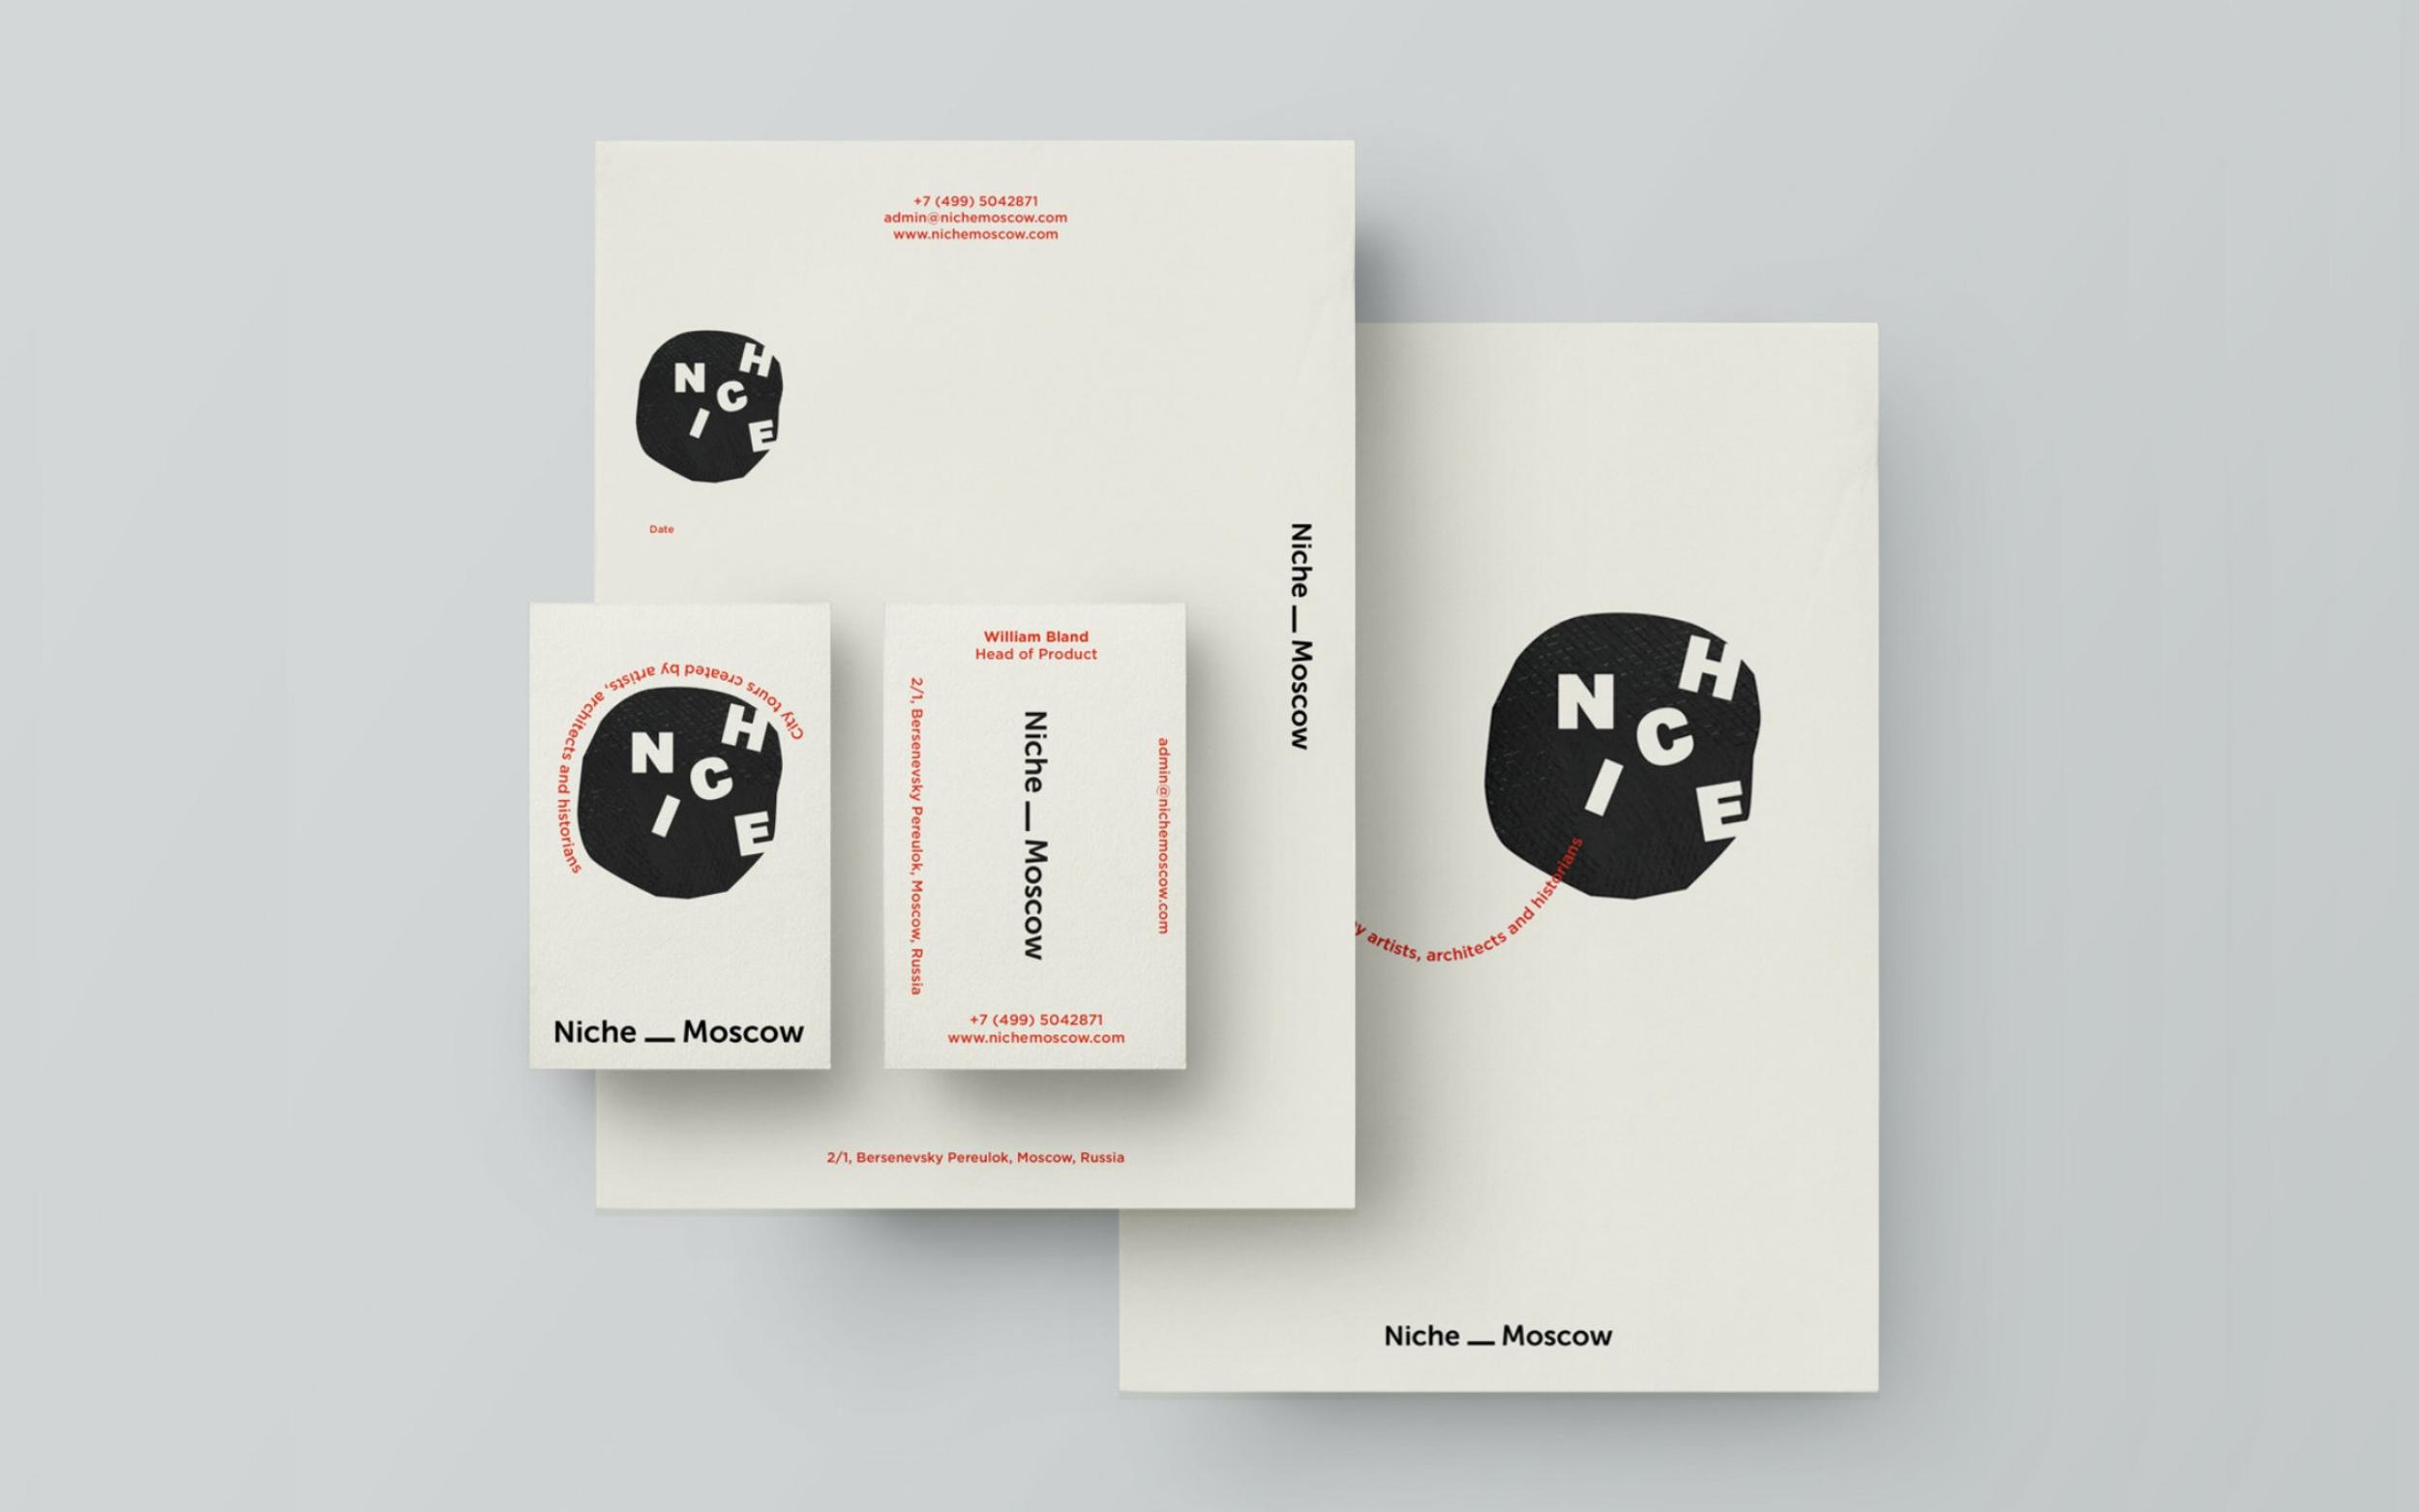 Niche Moscow Identity Design